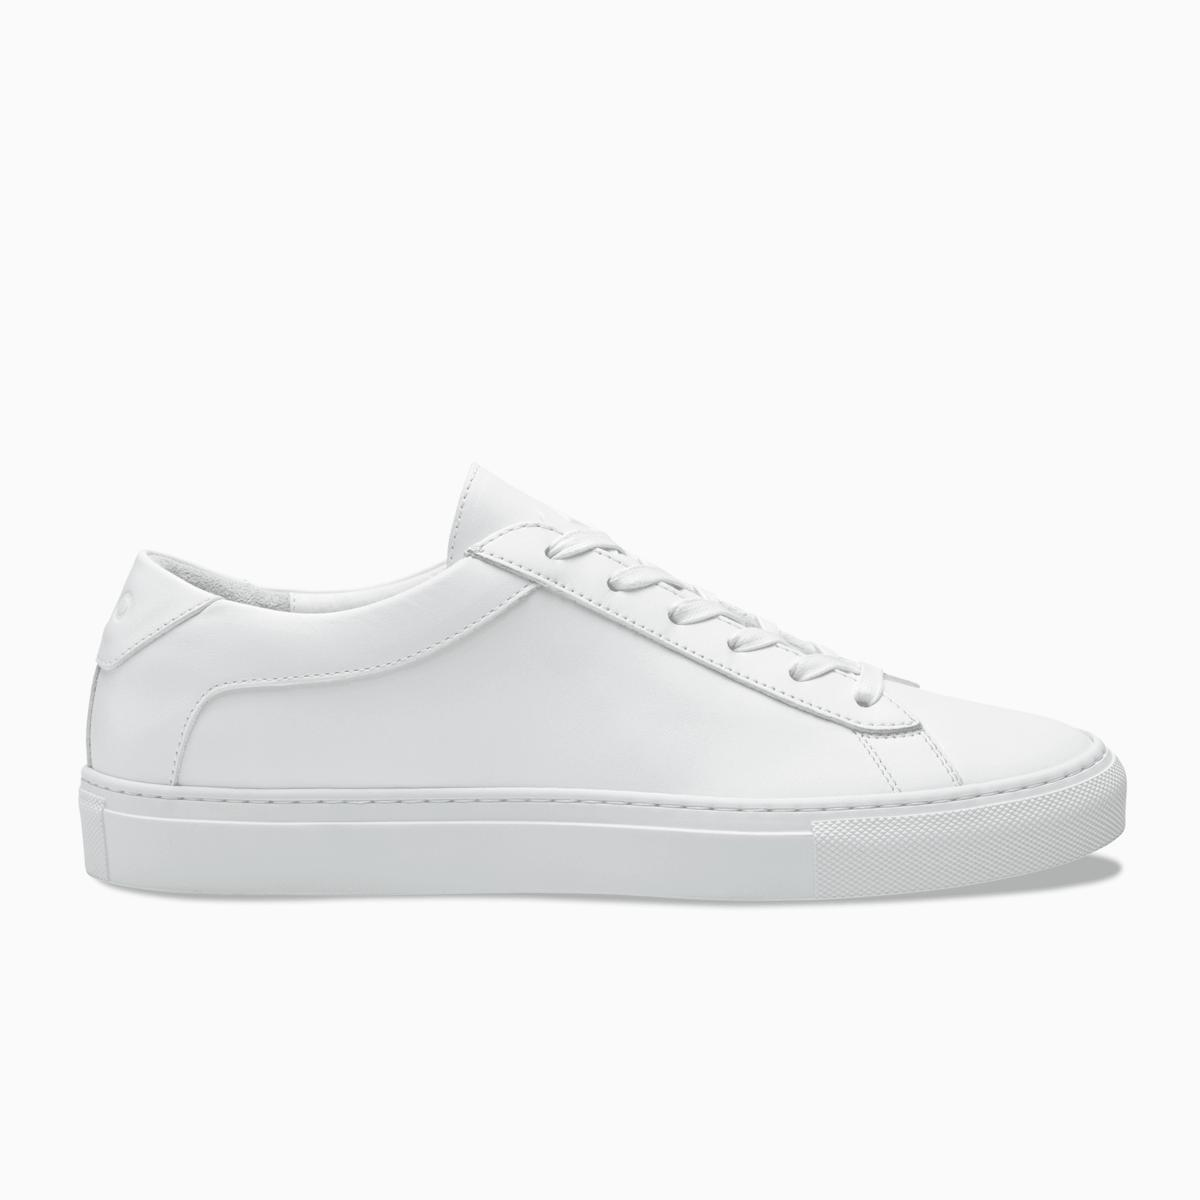 Capri Triple White White Leather Sneakers White Sneakers Men White Sneakers Women